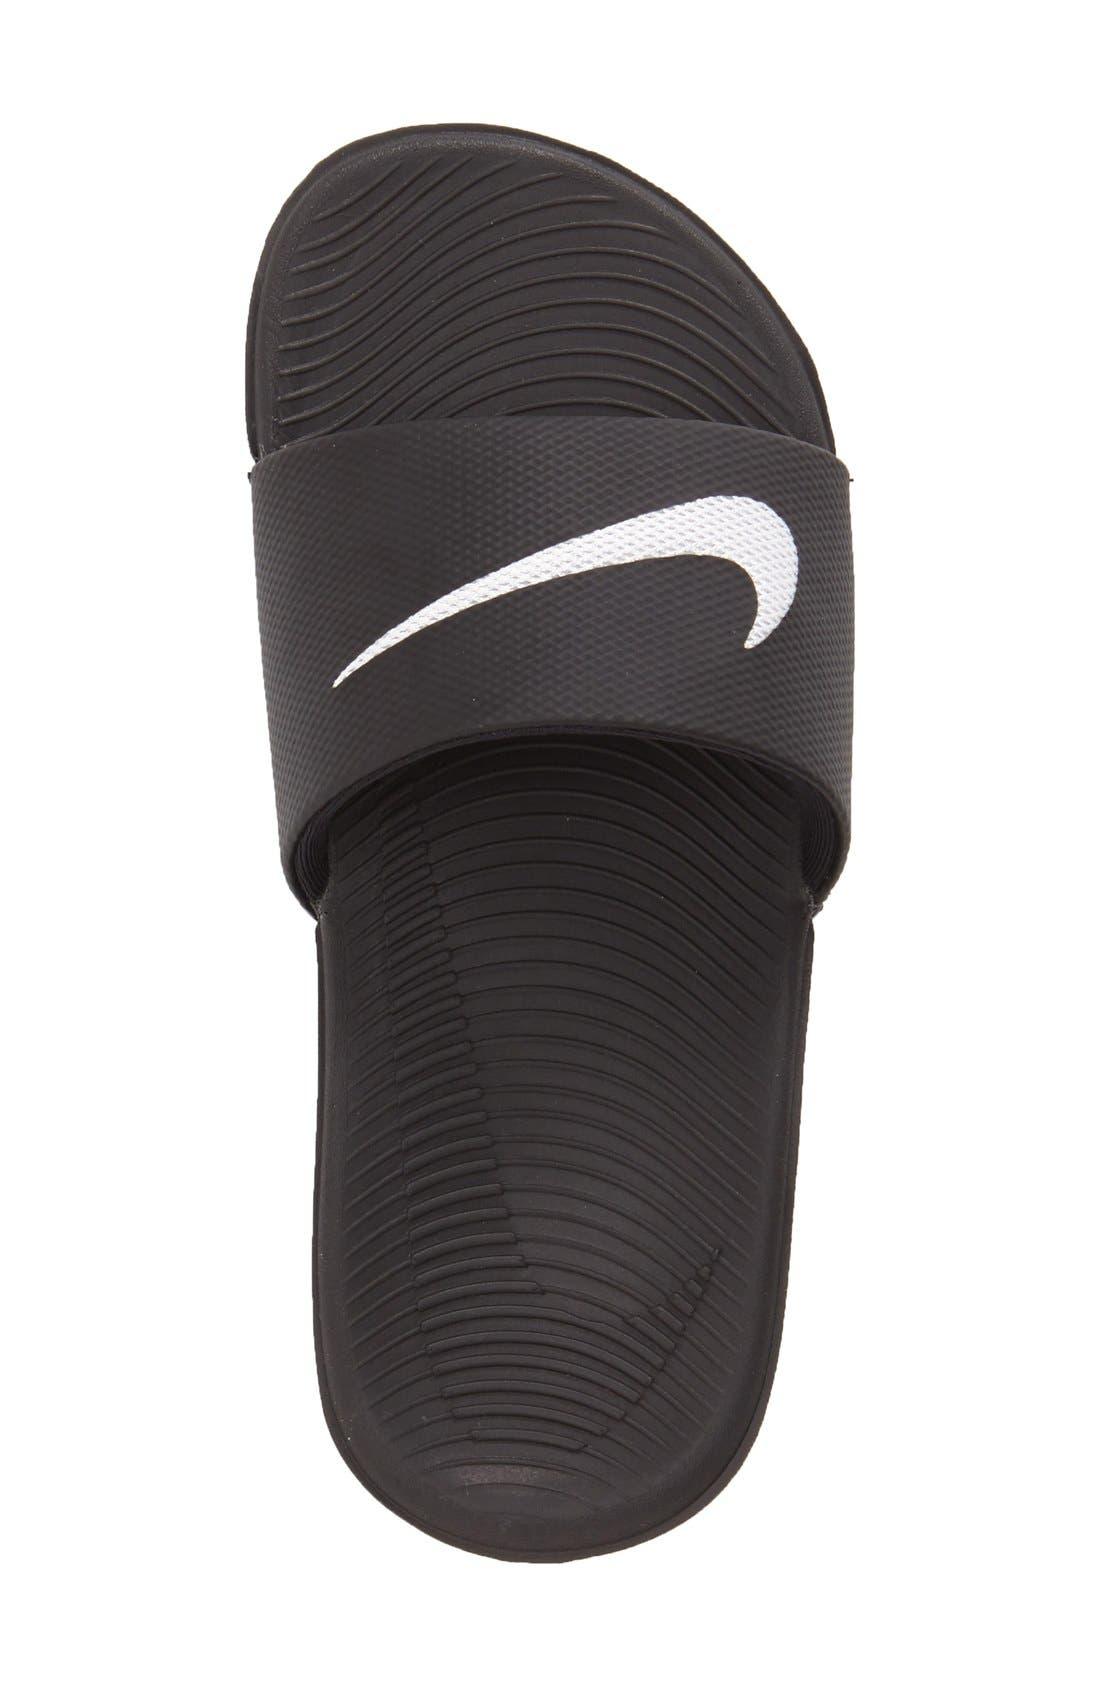 'Kawa' Slide Sandal,                             Alternate thumbnail 2, color,                             BLACK/ WHITE